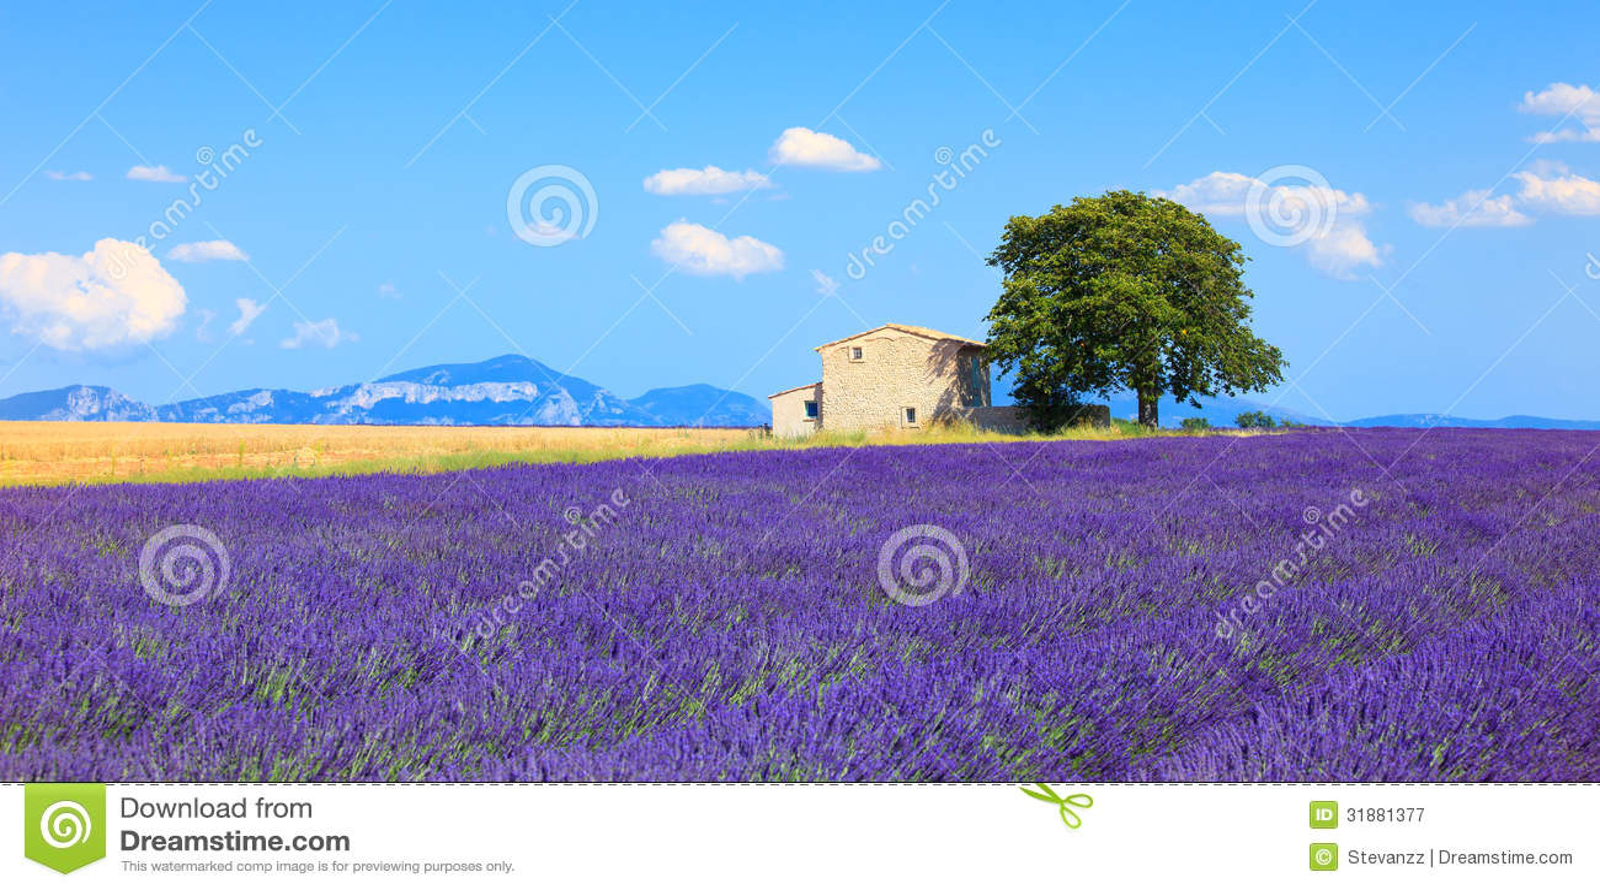 Lavendel blüht blühendes Feld, Haus und Baum. Provence, Franken